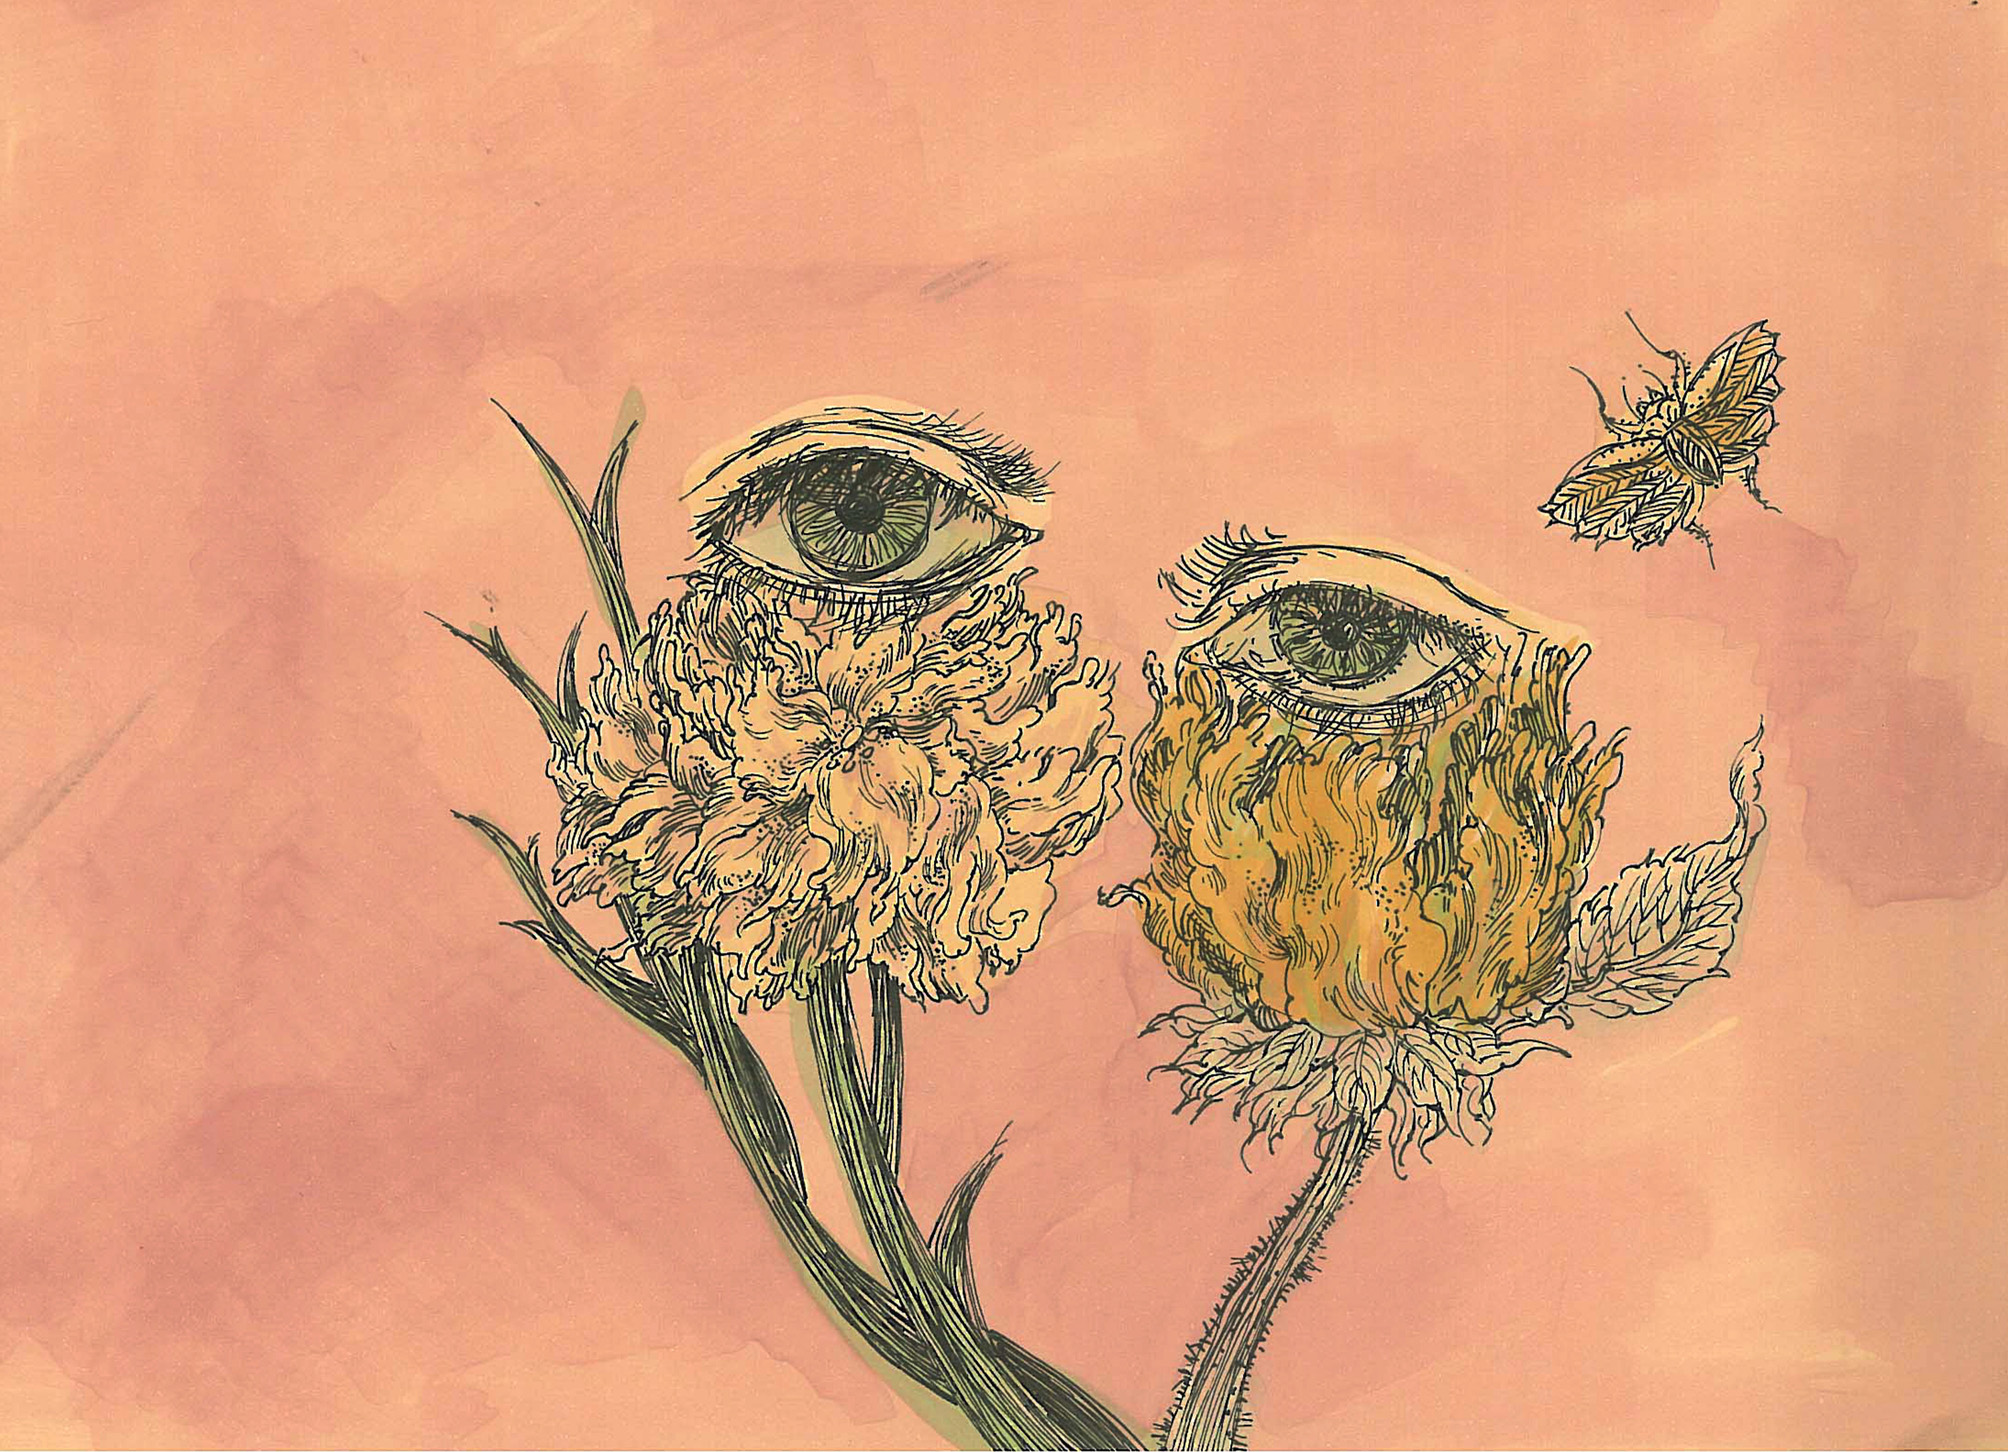 ART BY SARA DEHGHAN